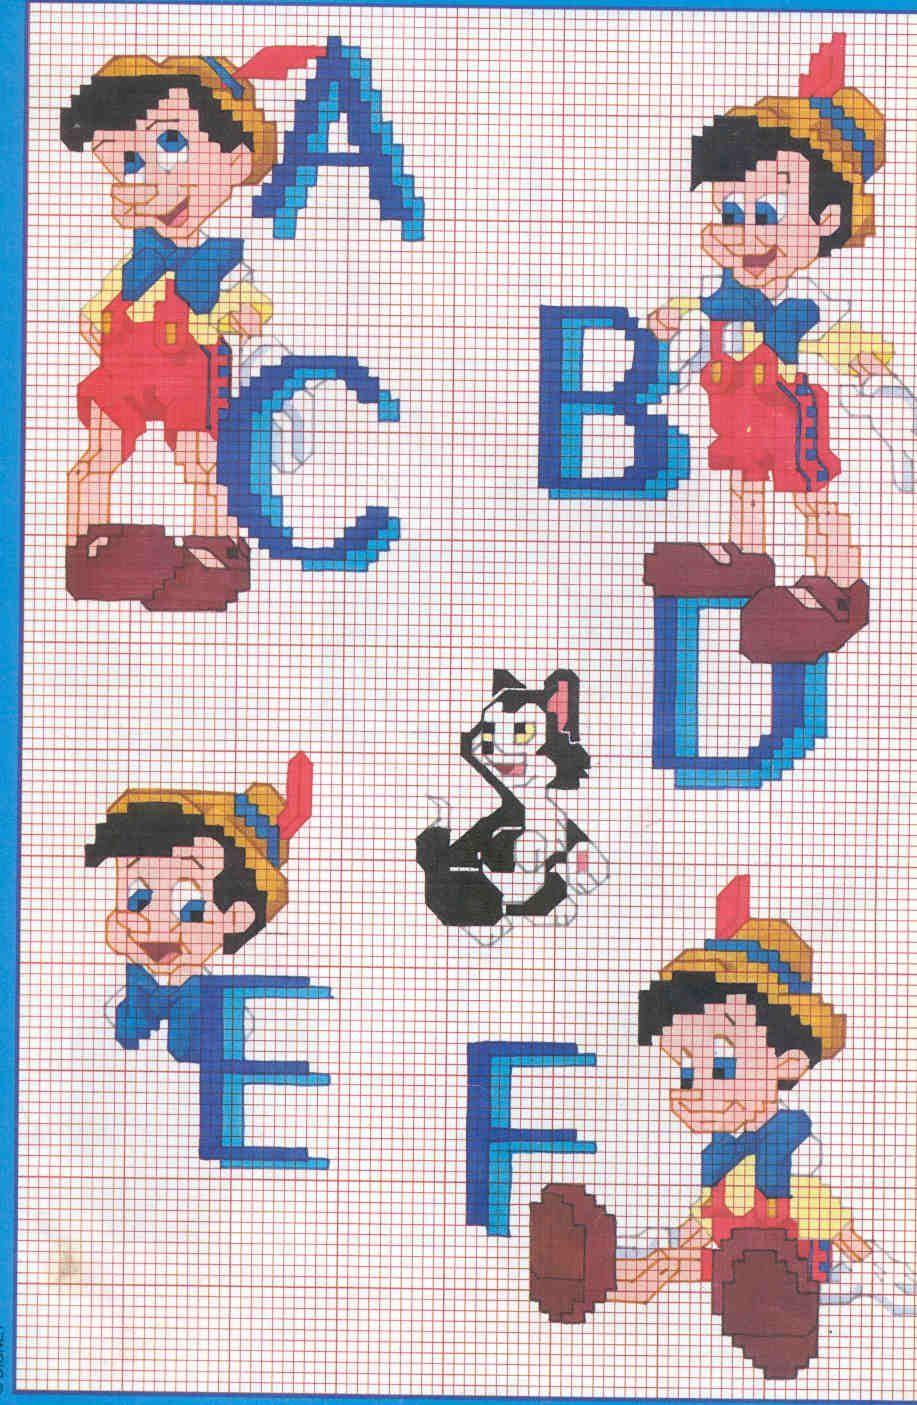 Schema punto croce alfabeto pinocchio 1 disney for Alfabeto punto croce disney gratis